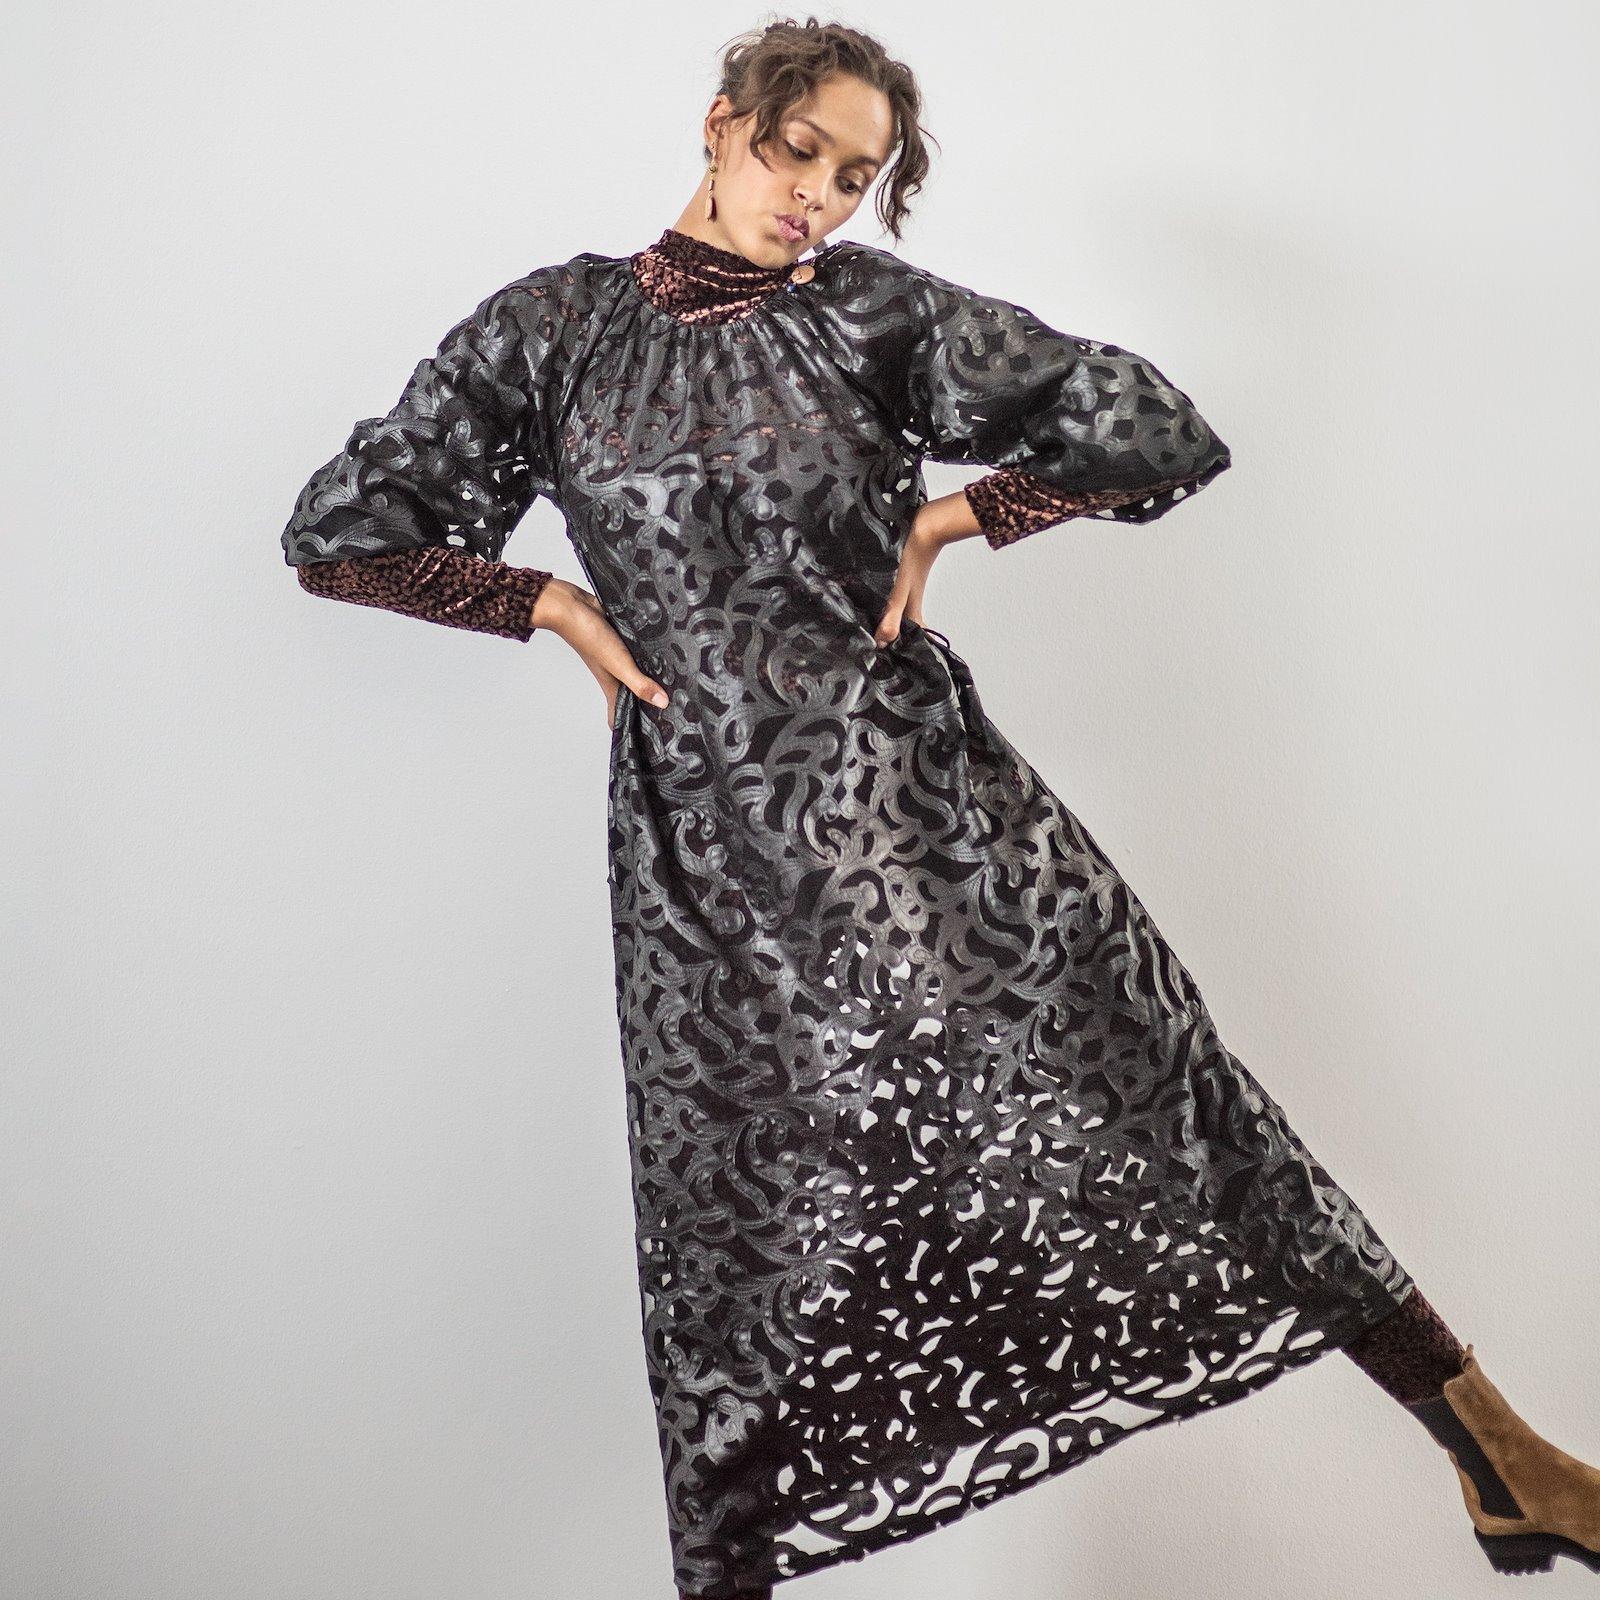 Dress and blouse, 40/12 p23167_640268_p23133_250757_sskit